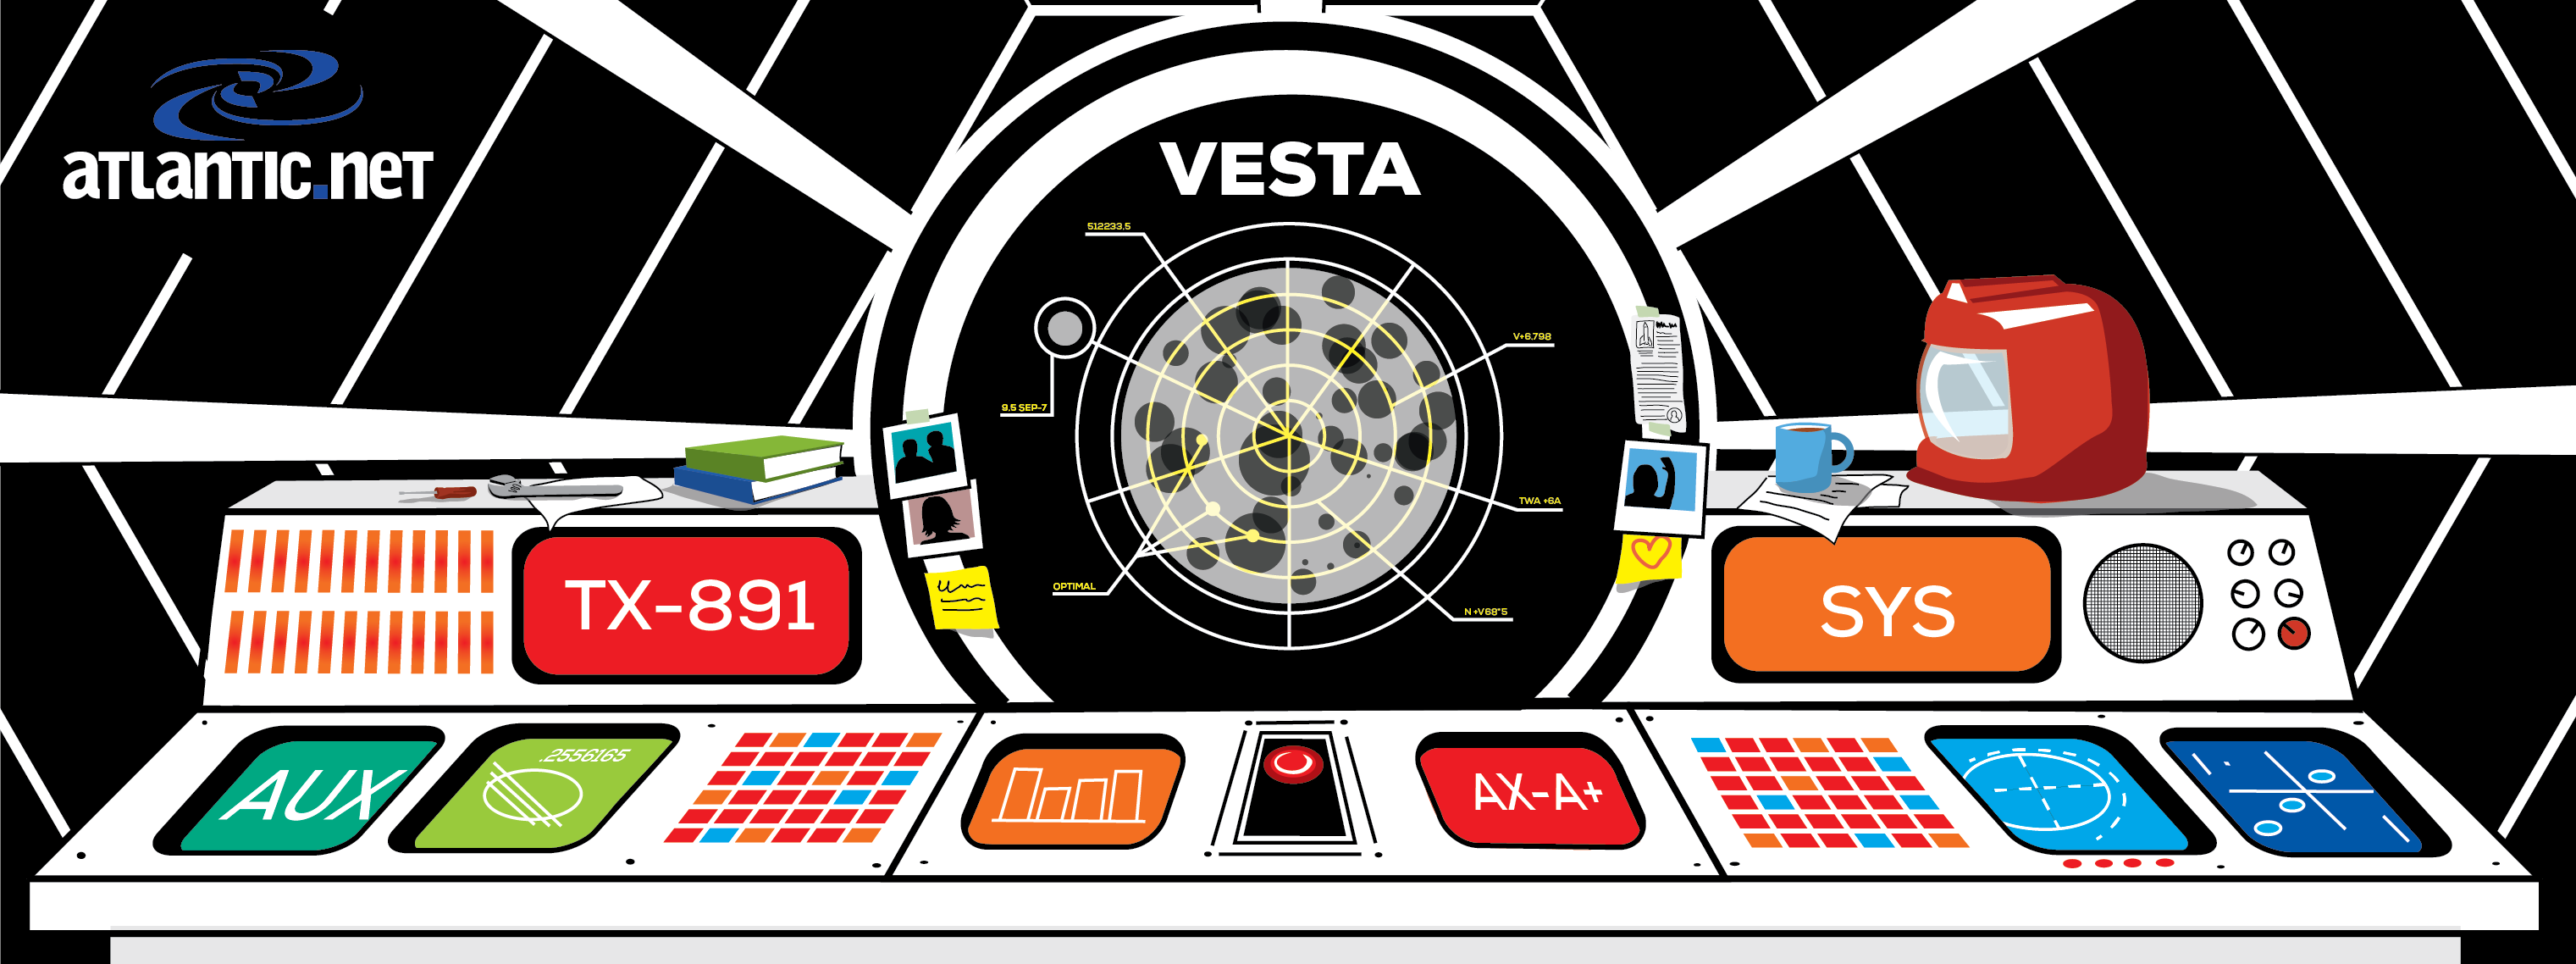 Vesta Control Panel Illustration by Walker Cahall